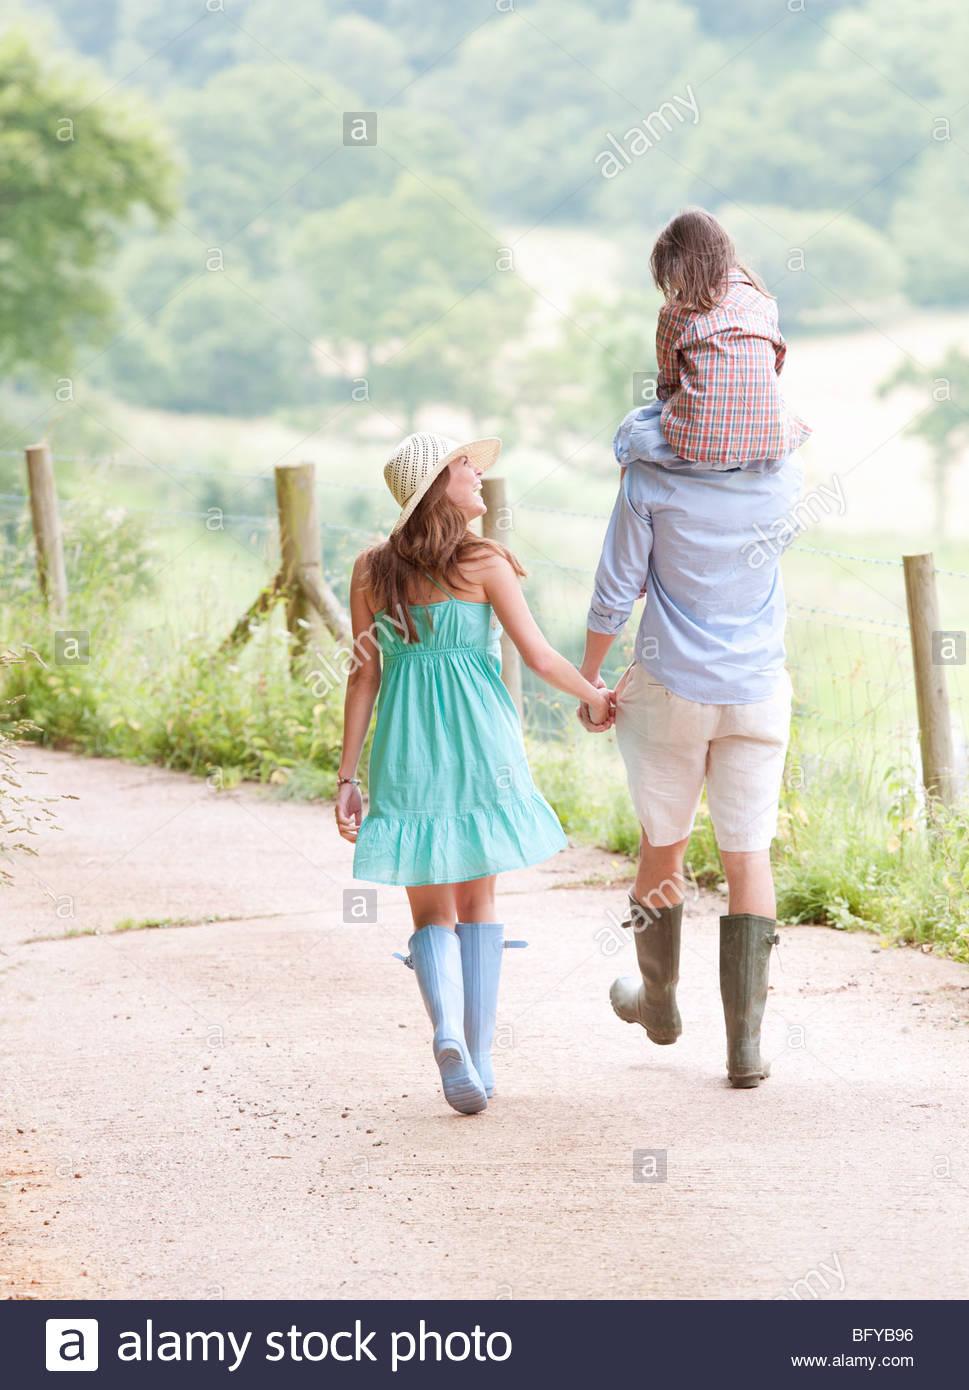 Family walking together on lane - Stock Image